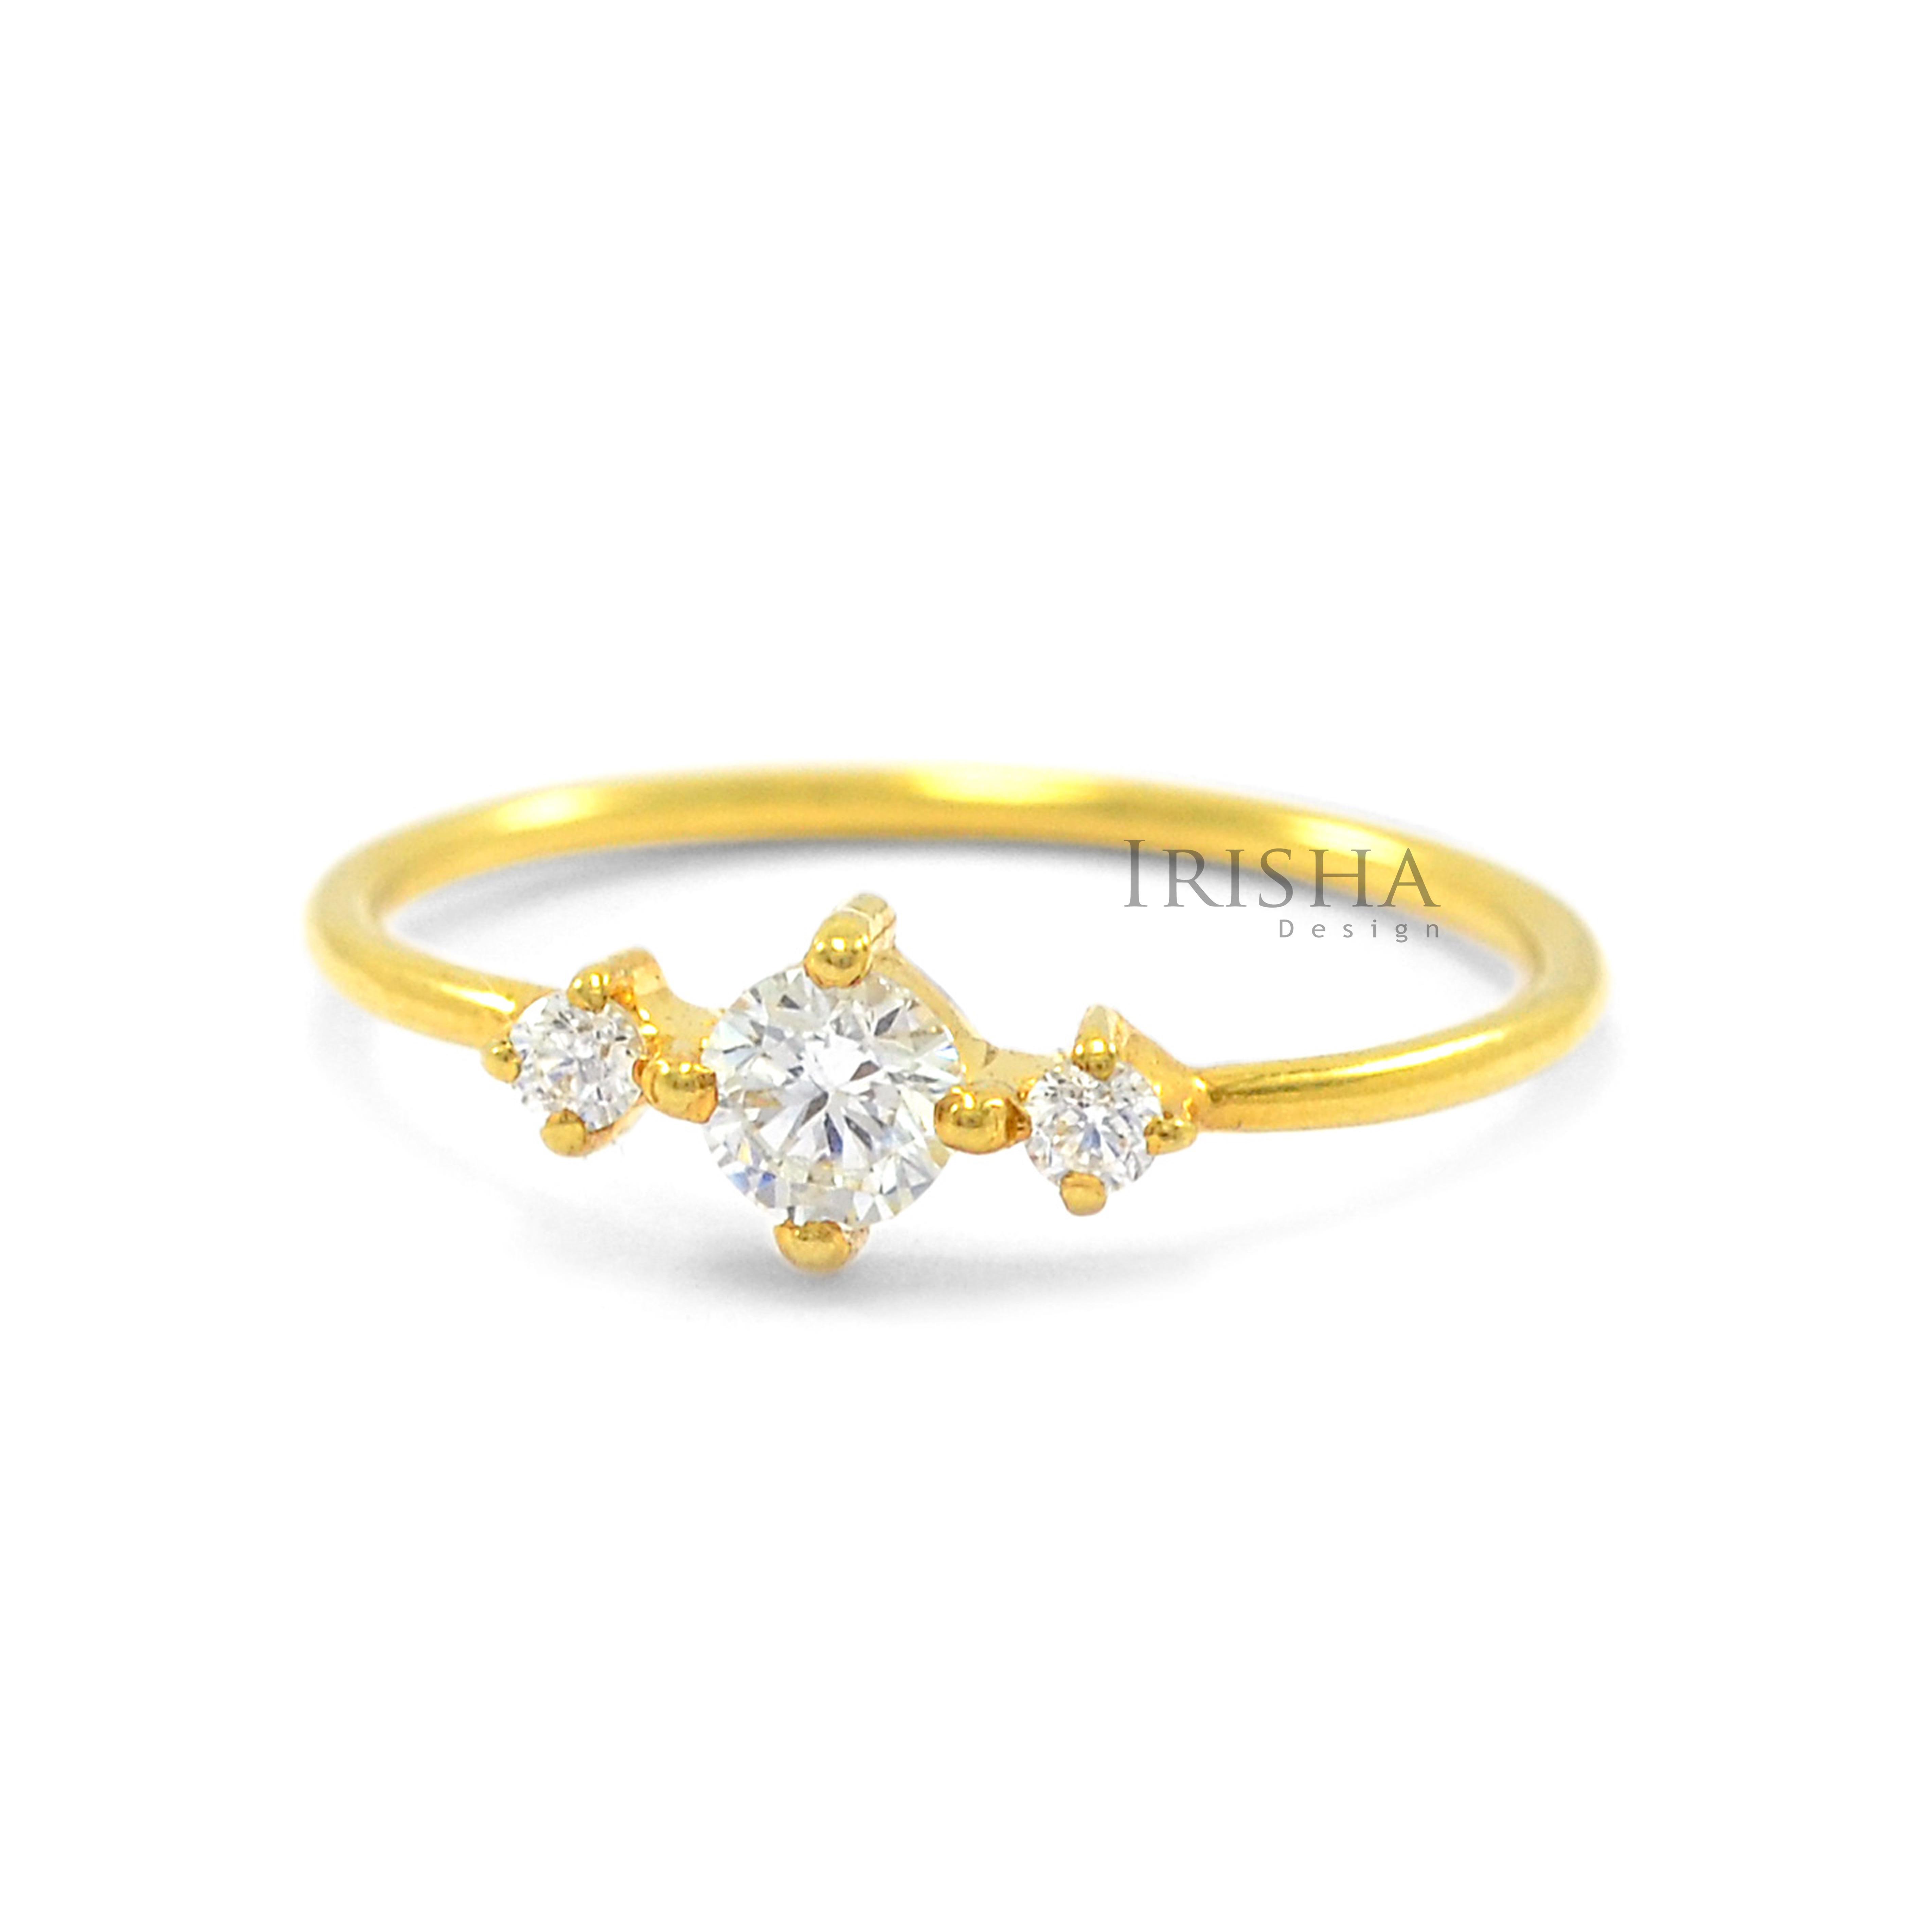 14K Gold 0.13 Ct. Genuine Three Diamond Engagement Ring Fine Jewelry Size-3 to 9